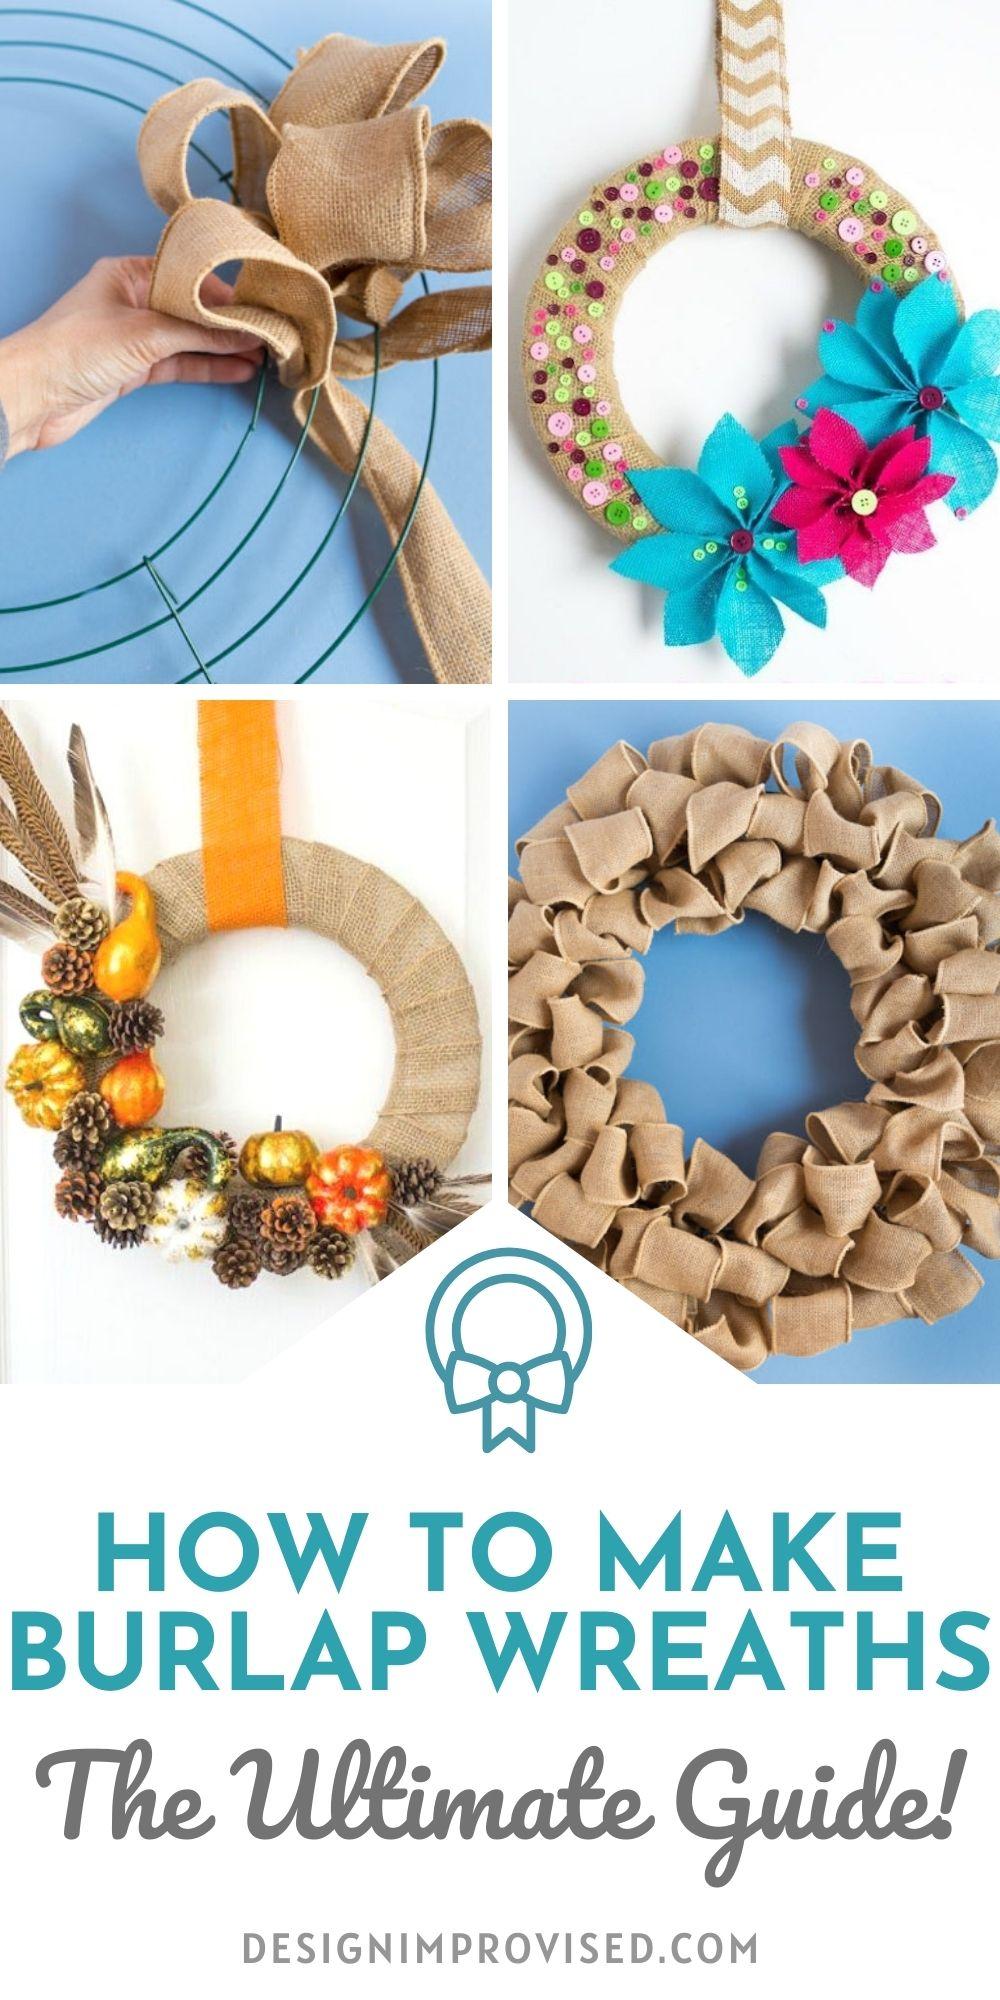 Diy Burlap Wreaths The Ultimate Guide Design Improvised